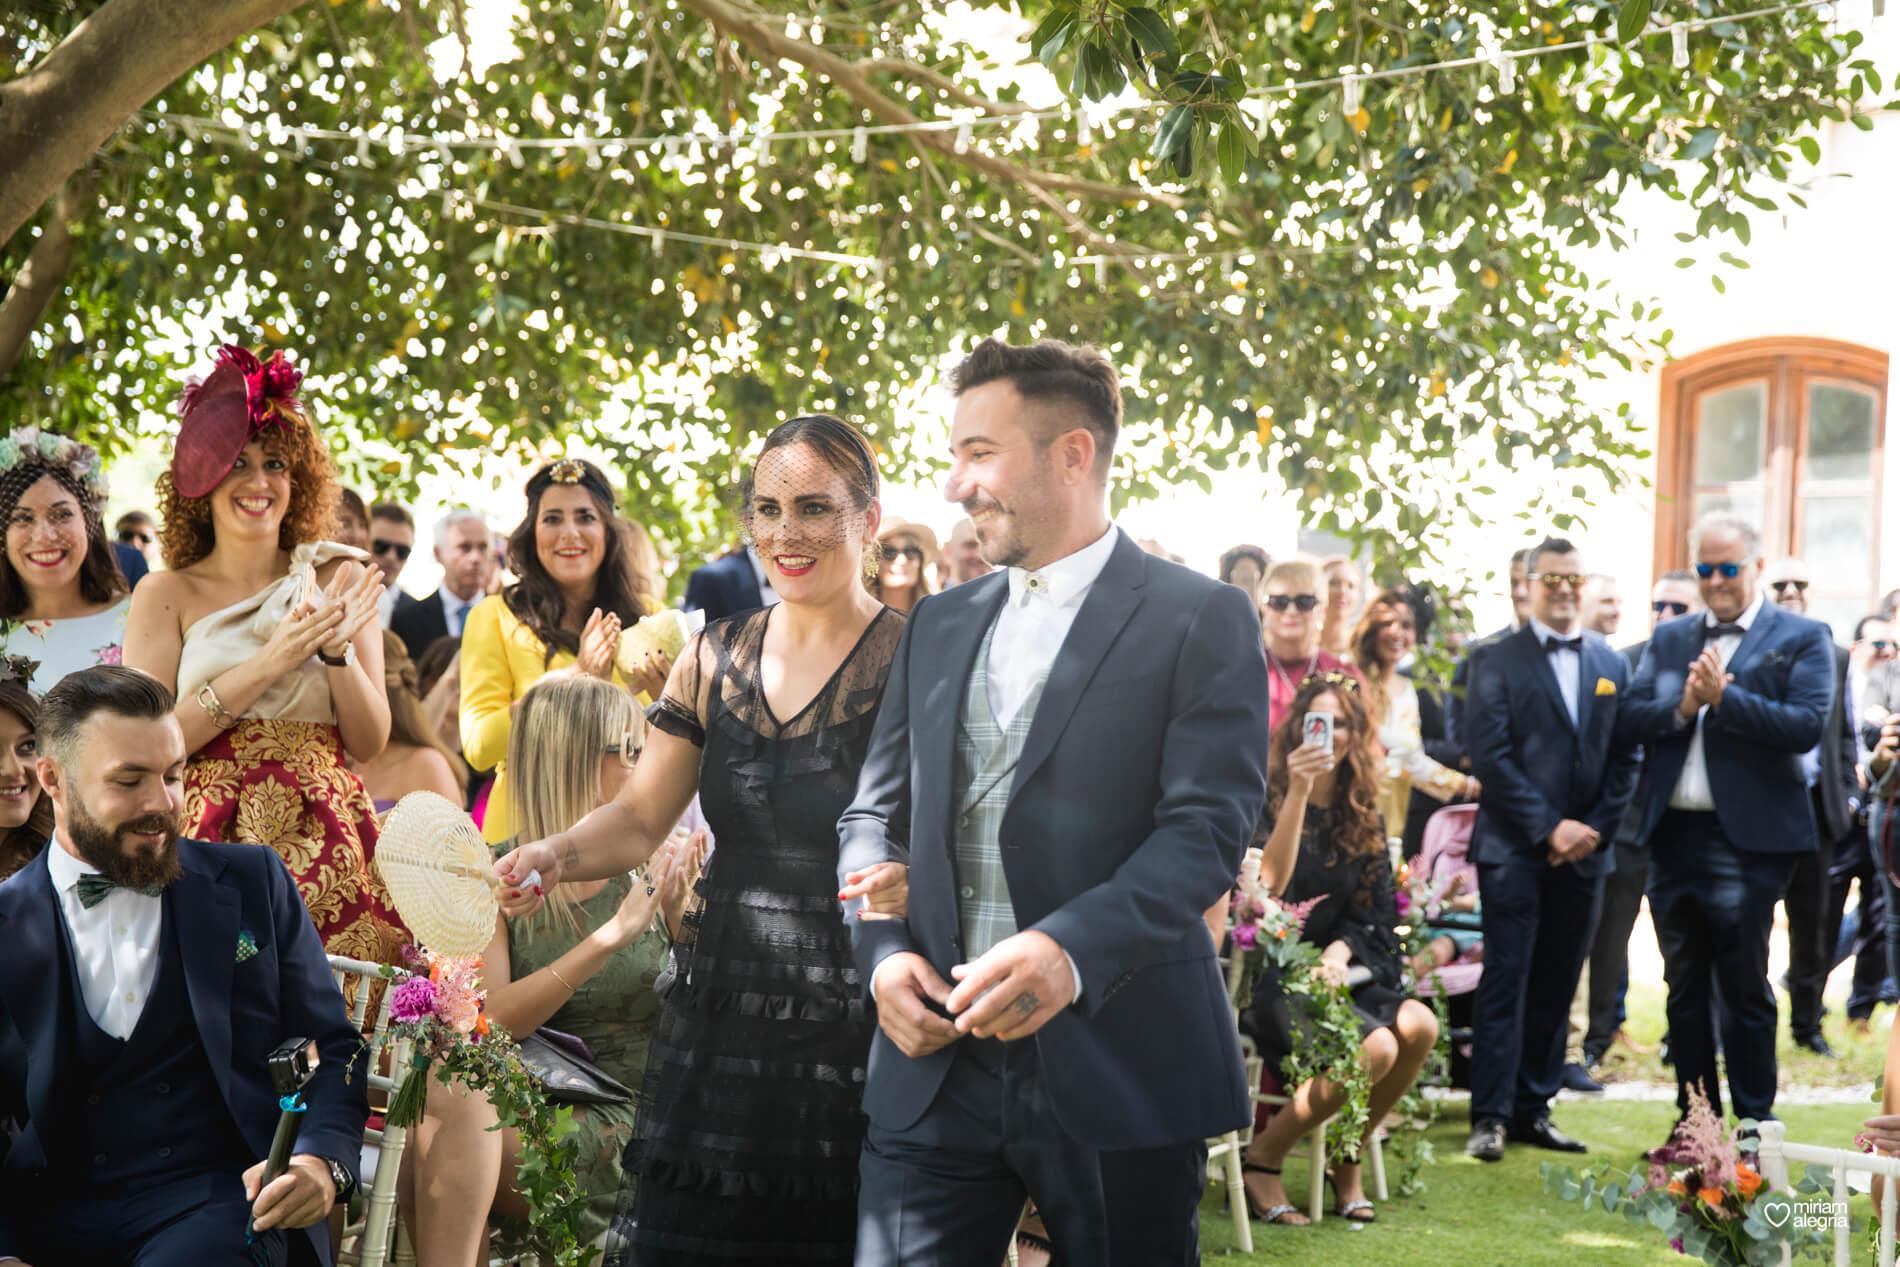 la-boda-de-alemc7-miriam-alegria-fotografos-boda-murcia-40